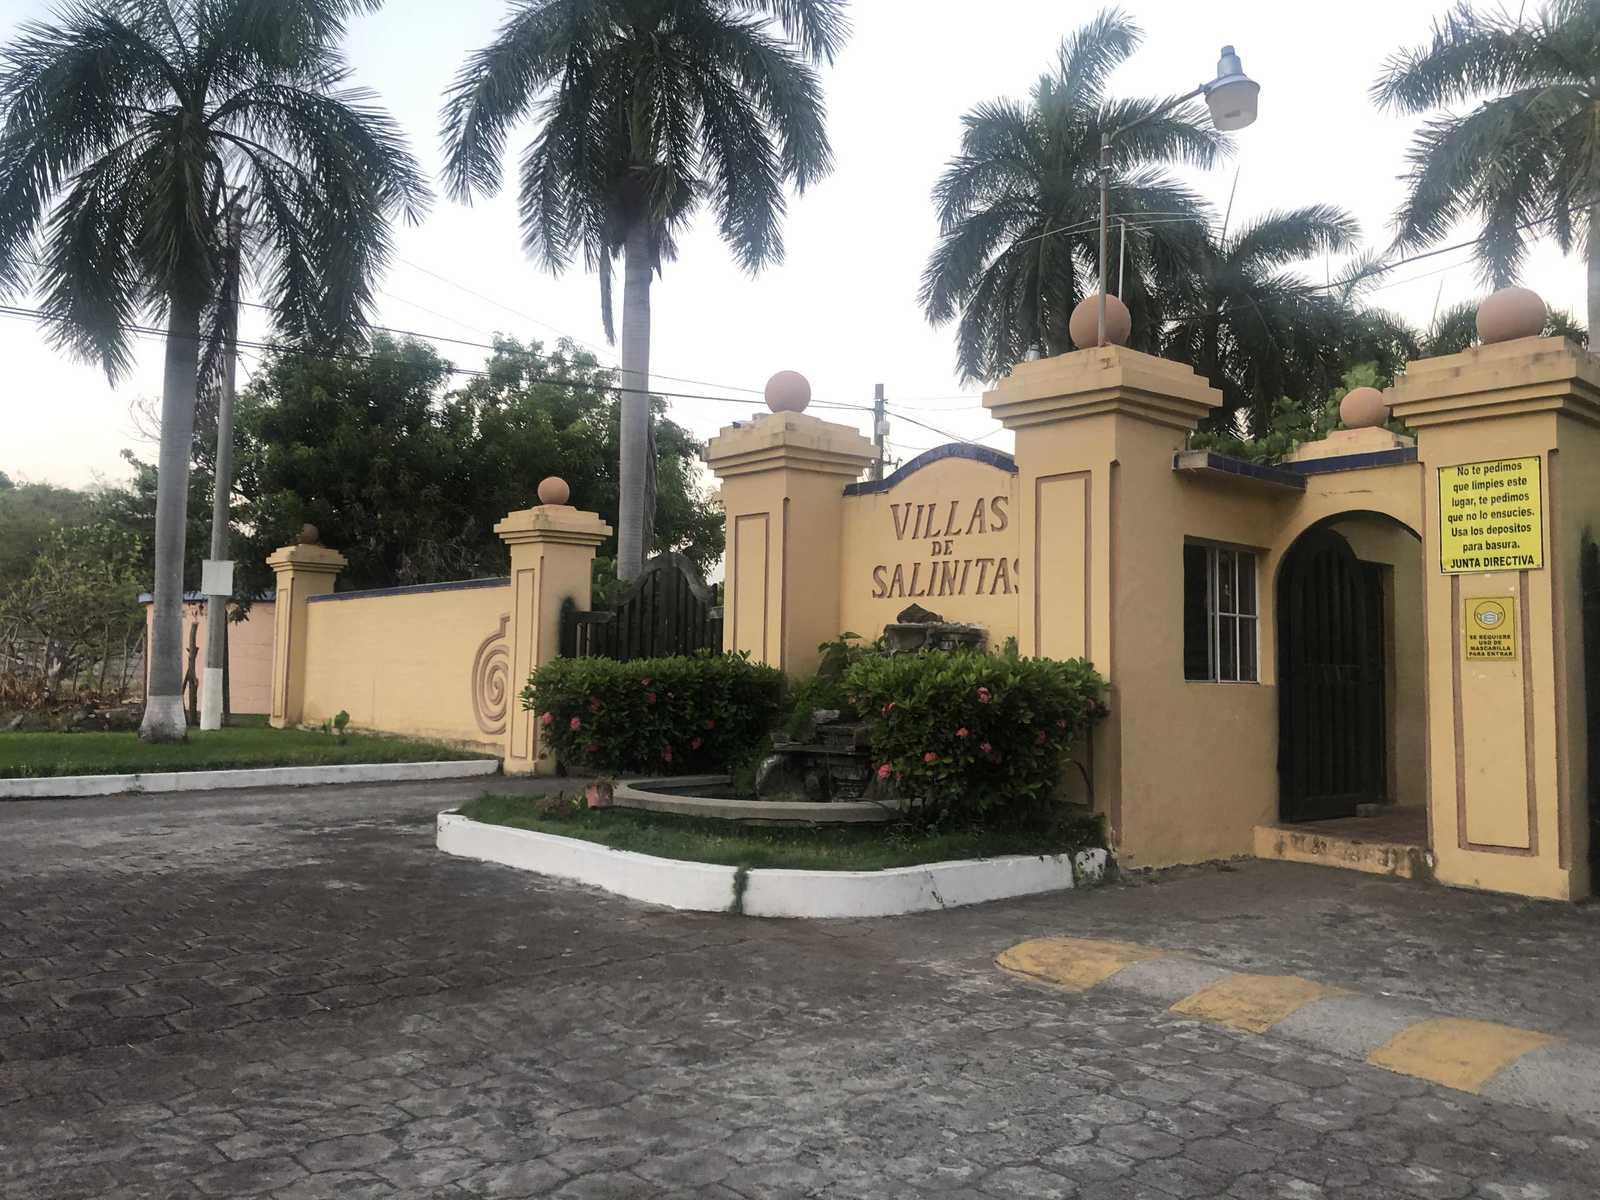 Casa Palmeras Salinitas